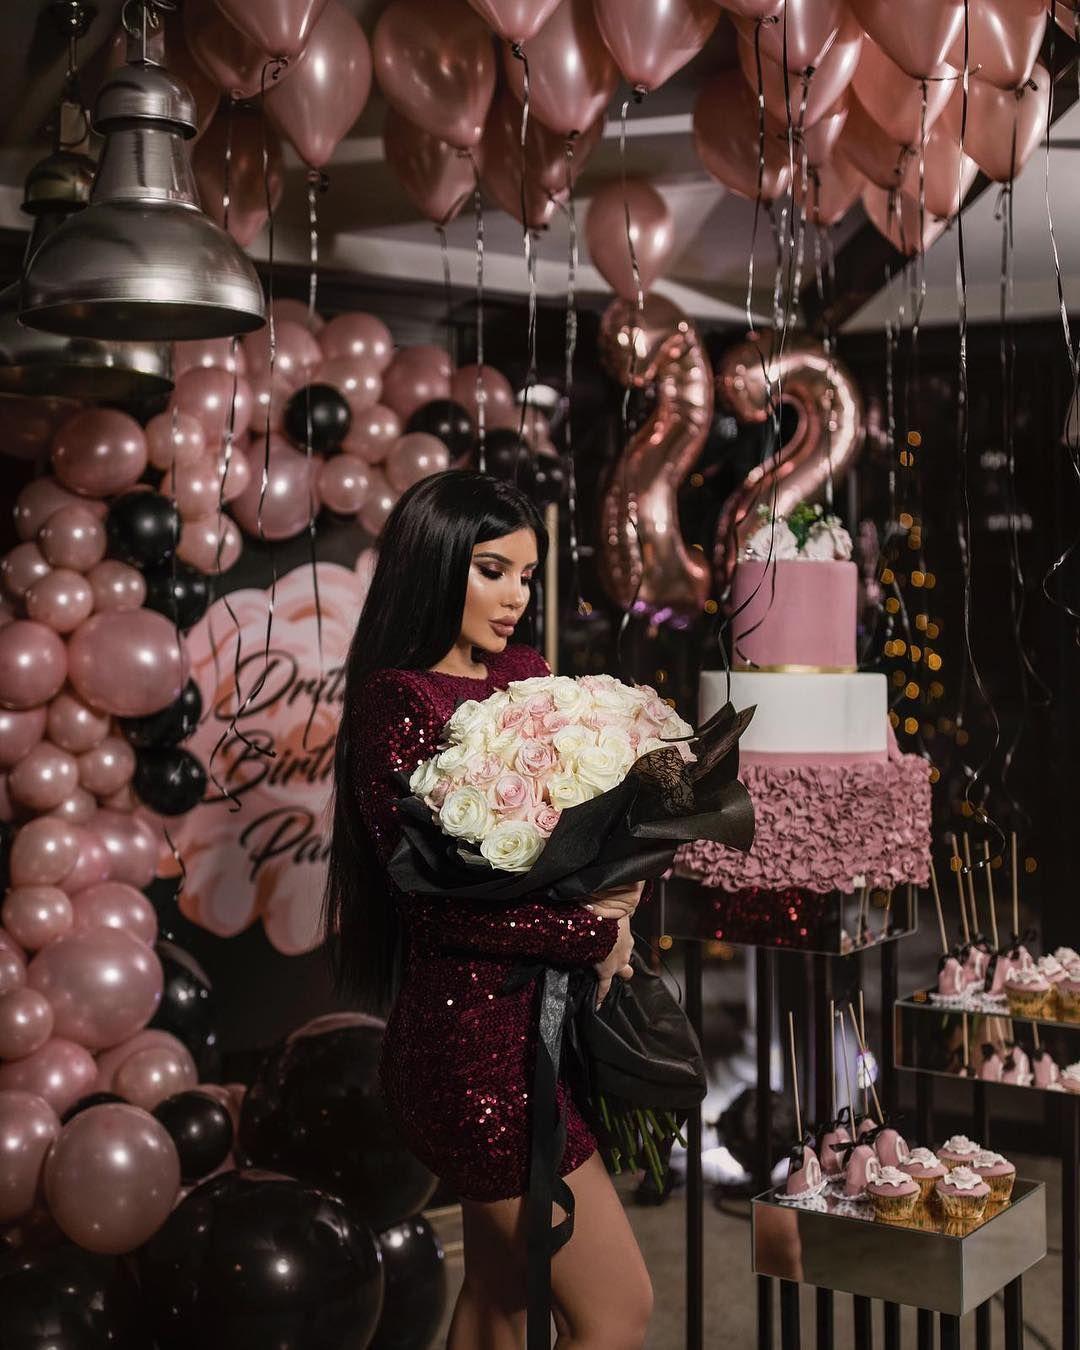 Pin By Taj Determination Mil On Moms Birthday 21st Birthday Decorations 18th Birthday Party Birthday Decorations